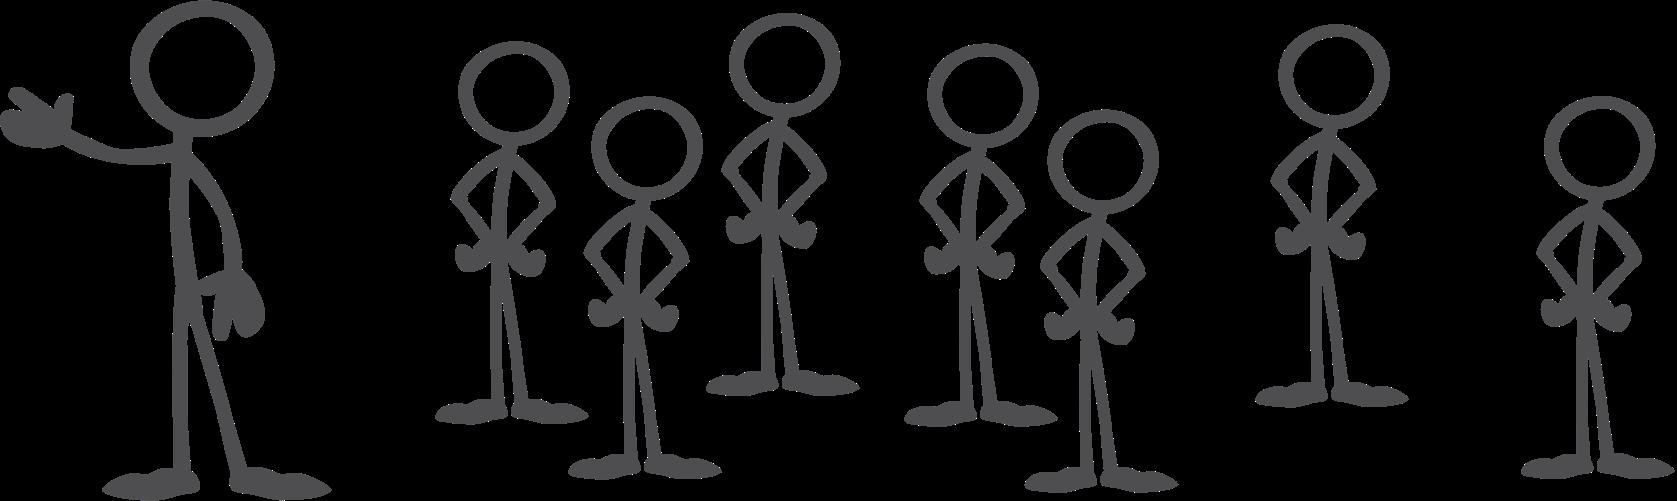 stick figure logo